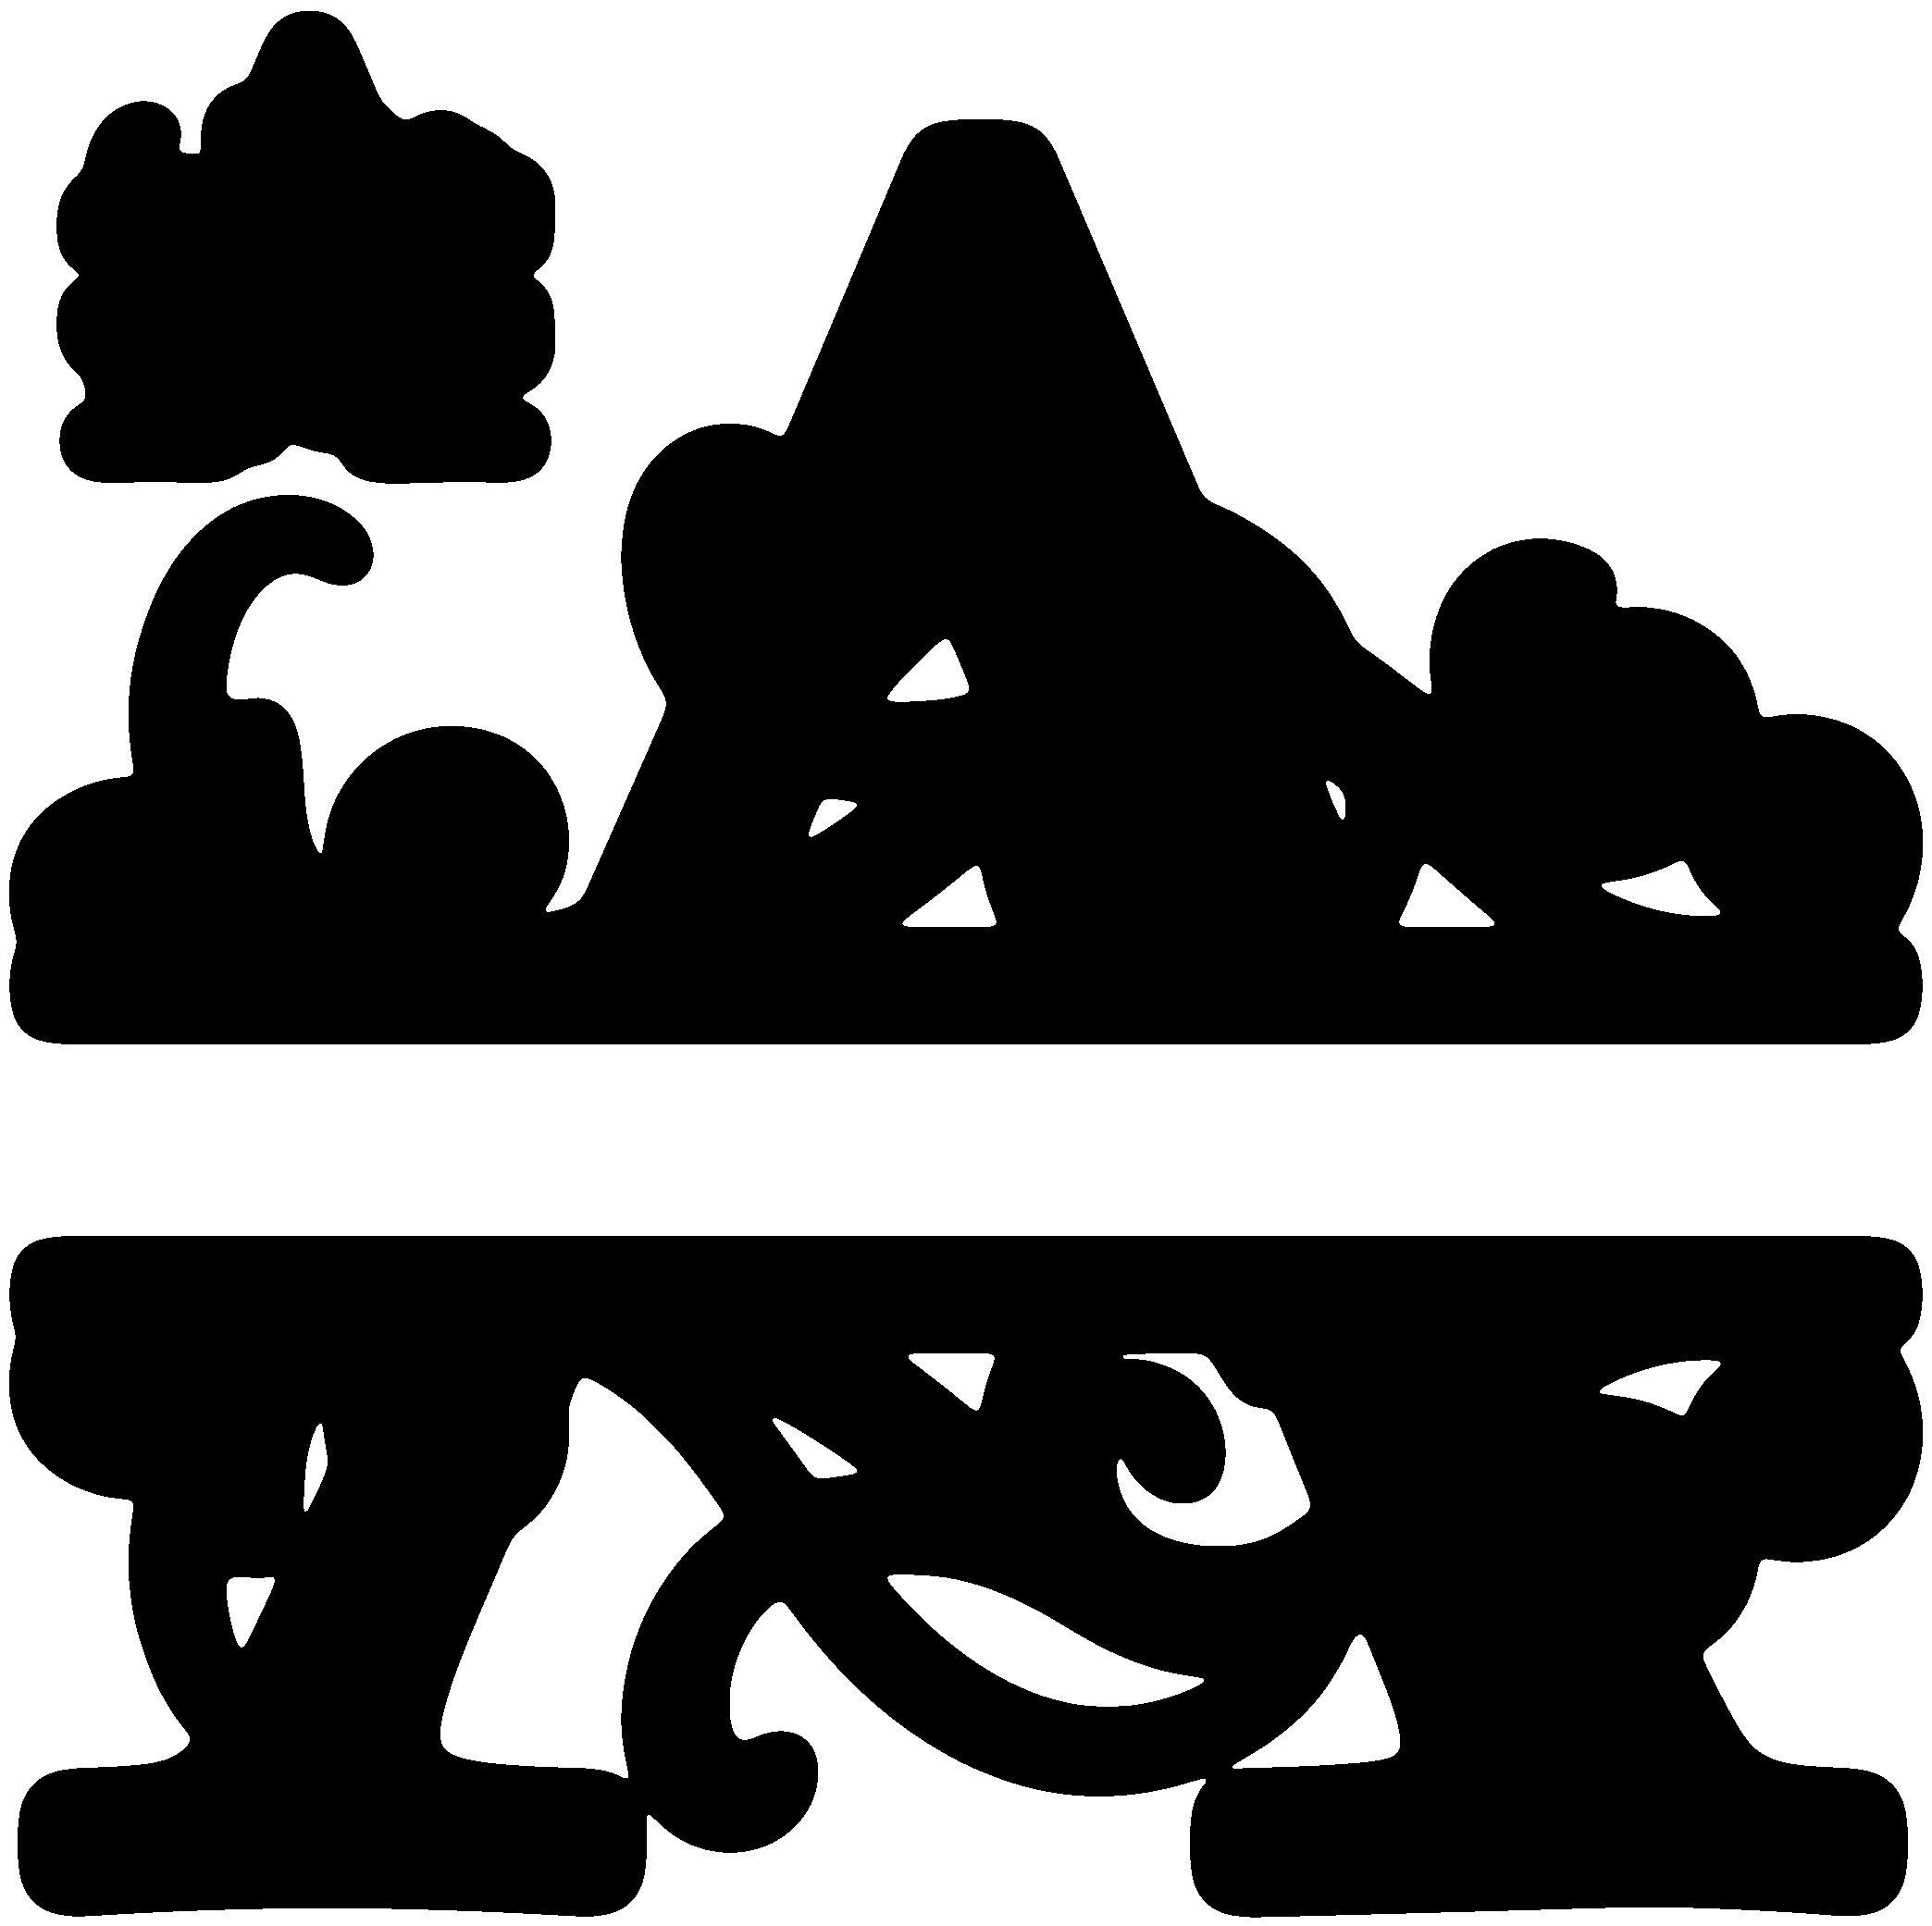 Flourish clipart monogram. A split silhouette graphics